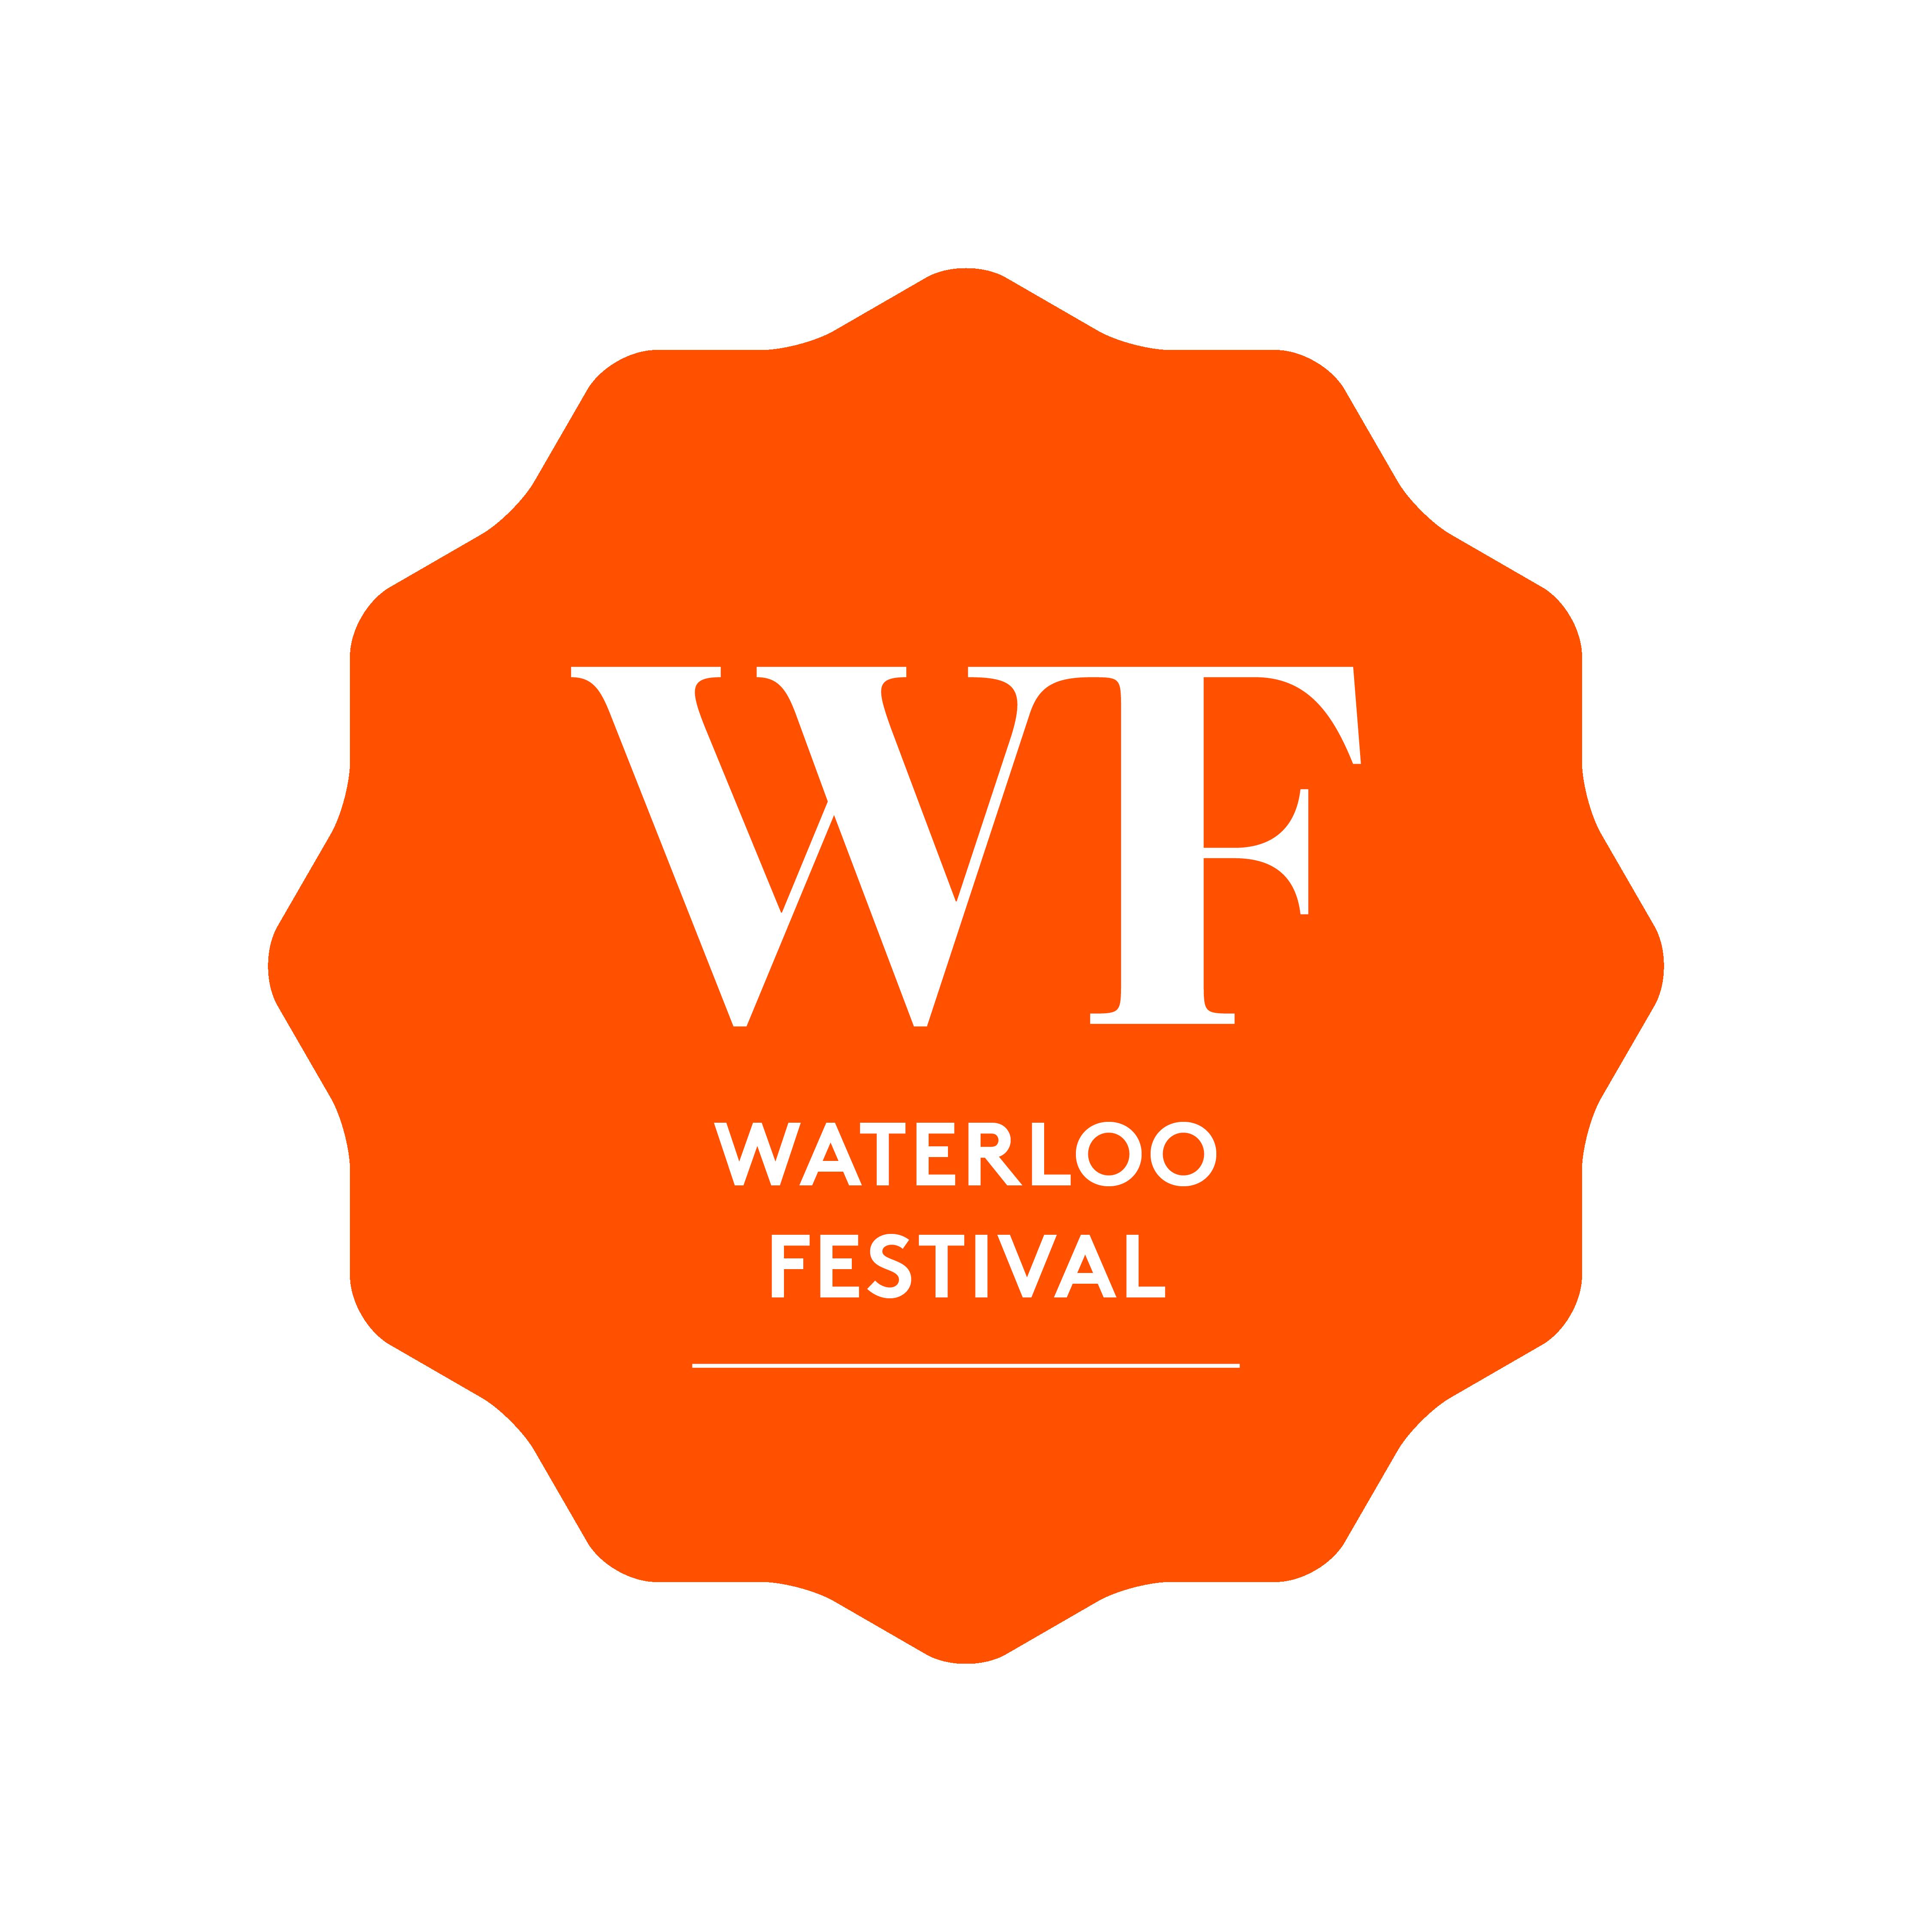 Waterloo Festival - Art of Moog banner image